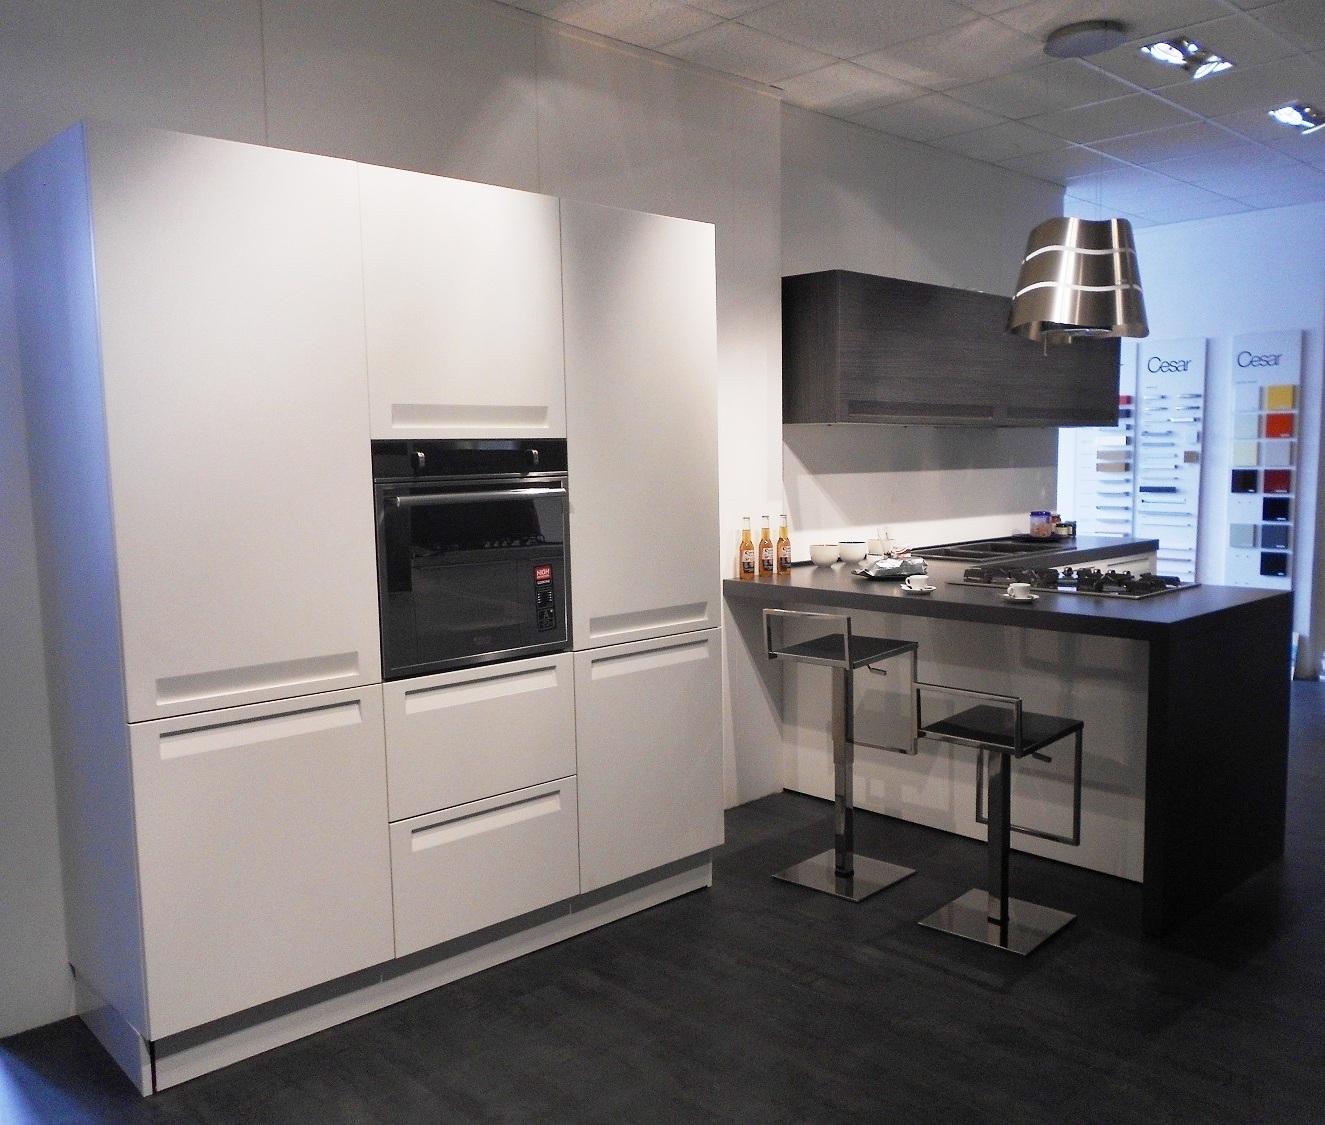 Cucina mod frida cesar cucine polimerico opaco scontata del 50 cucine a prezzi scontati - Pensili cucina prezzi ...